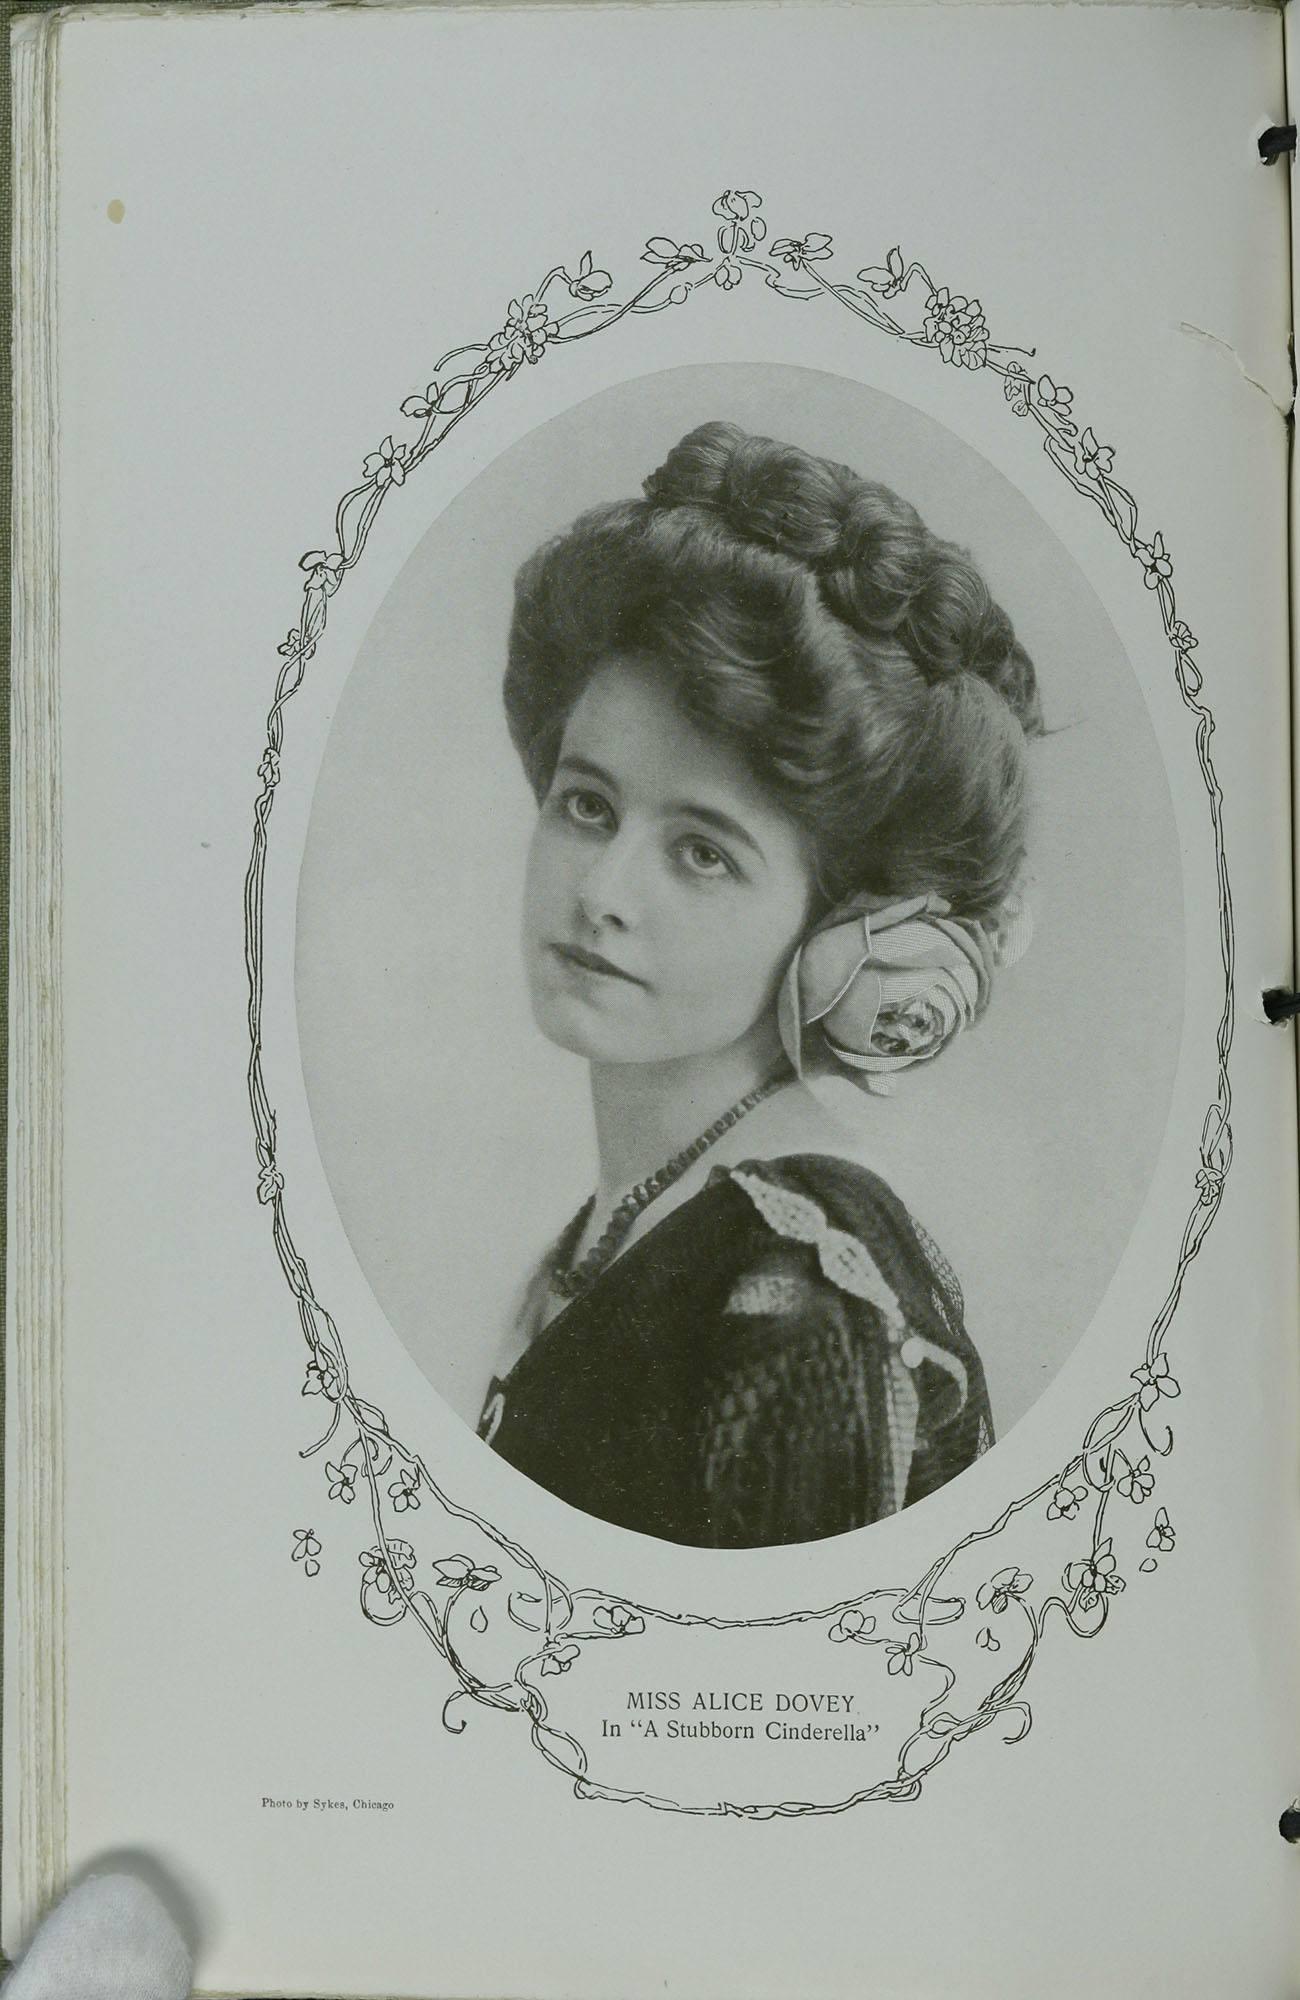 Alice Dovey